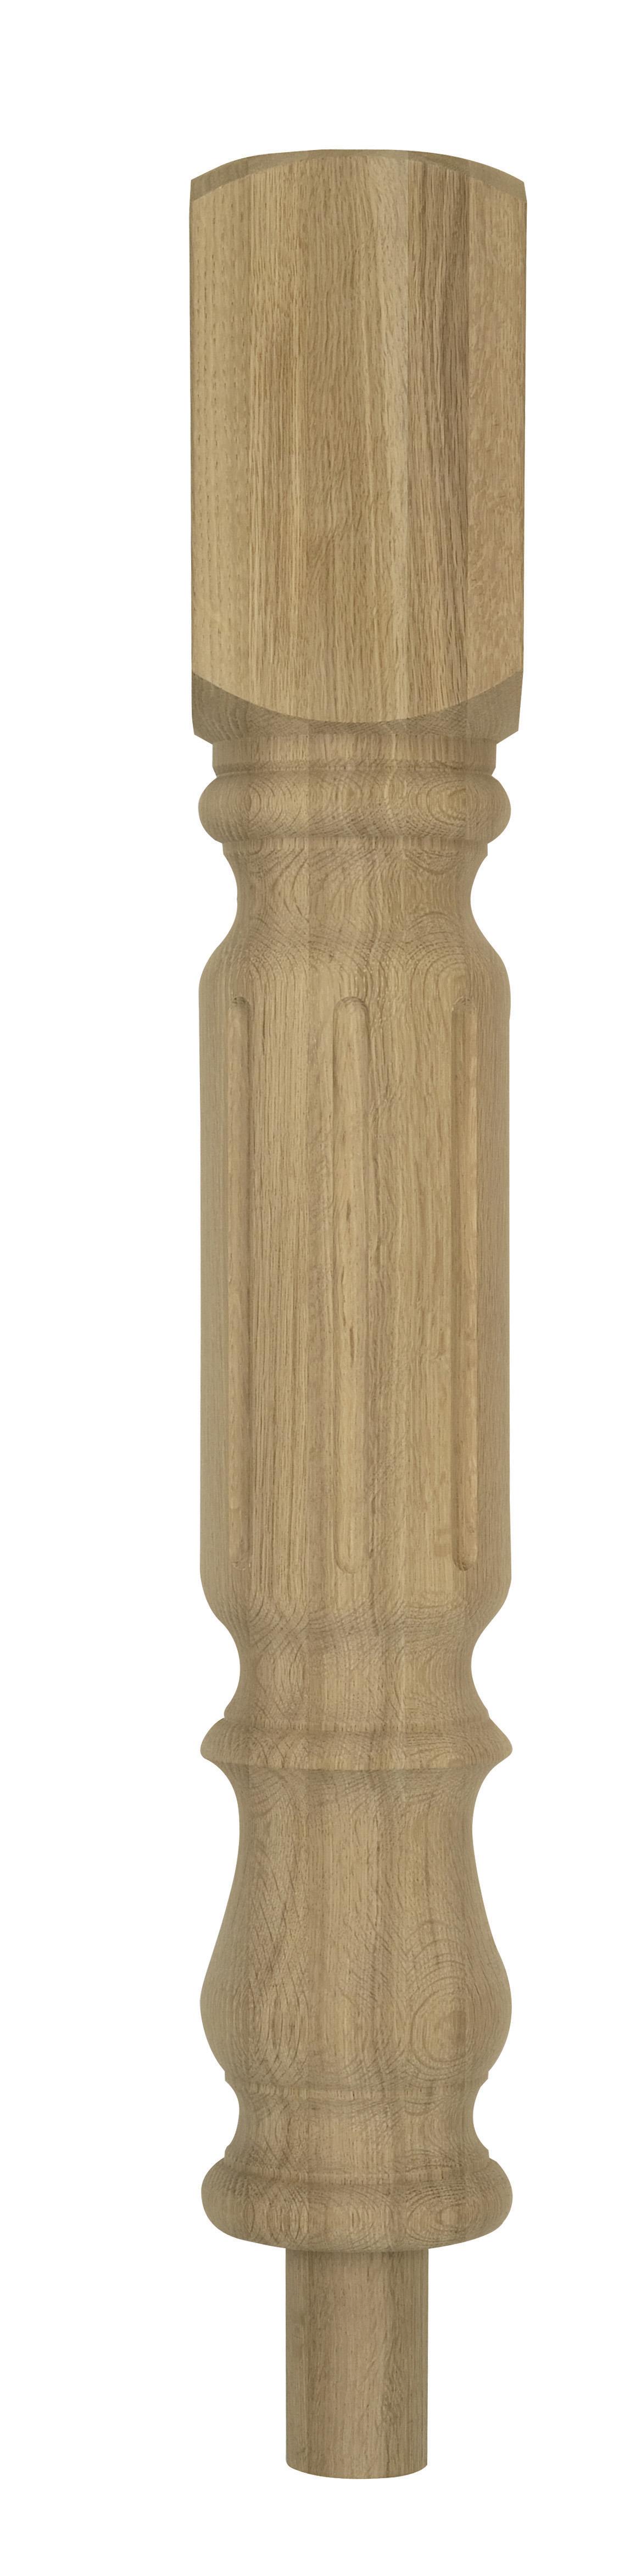 1 Oak Granby Top/Bottom Newel